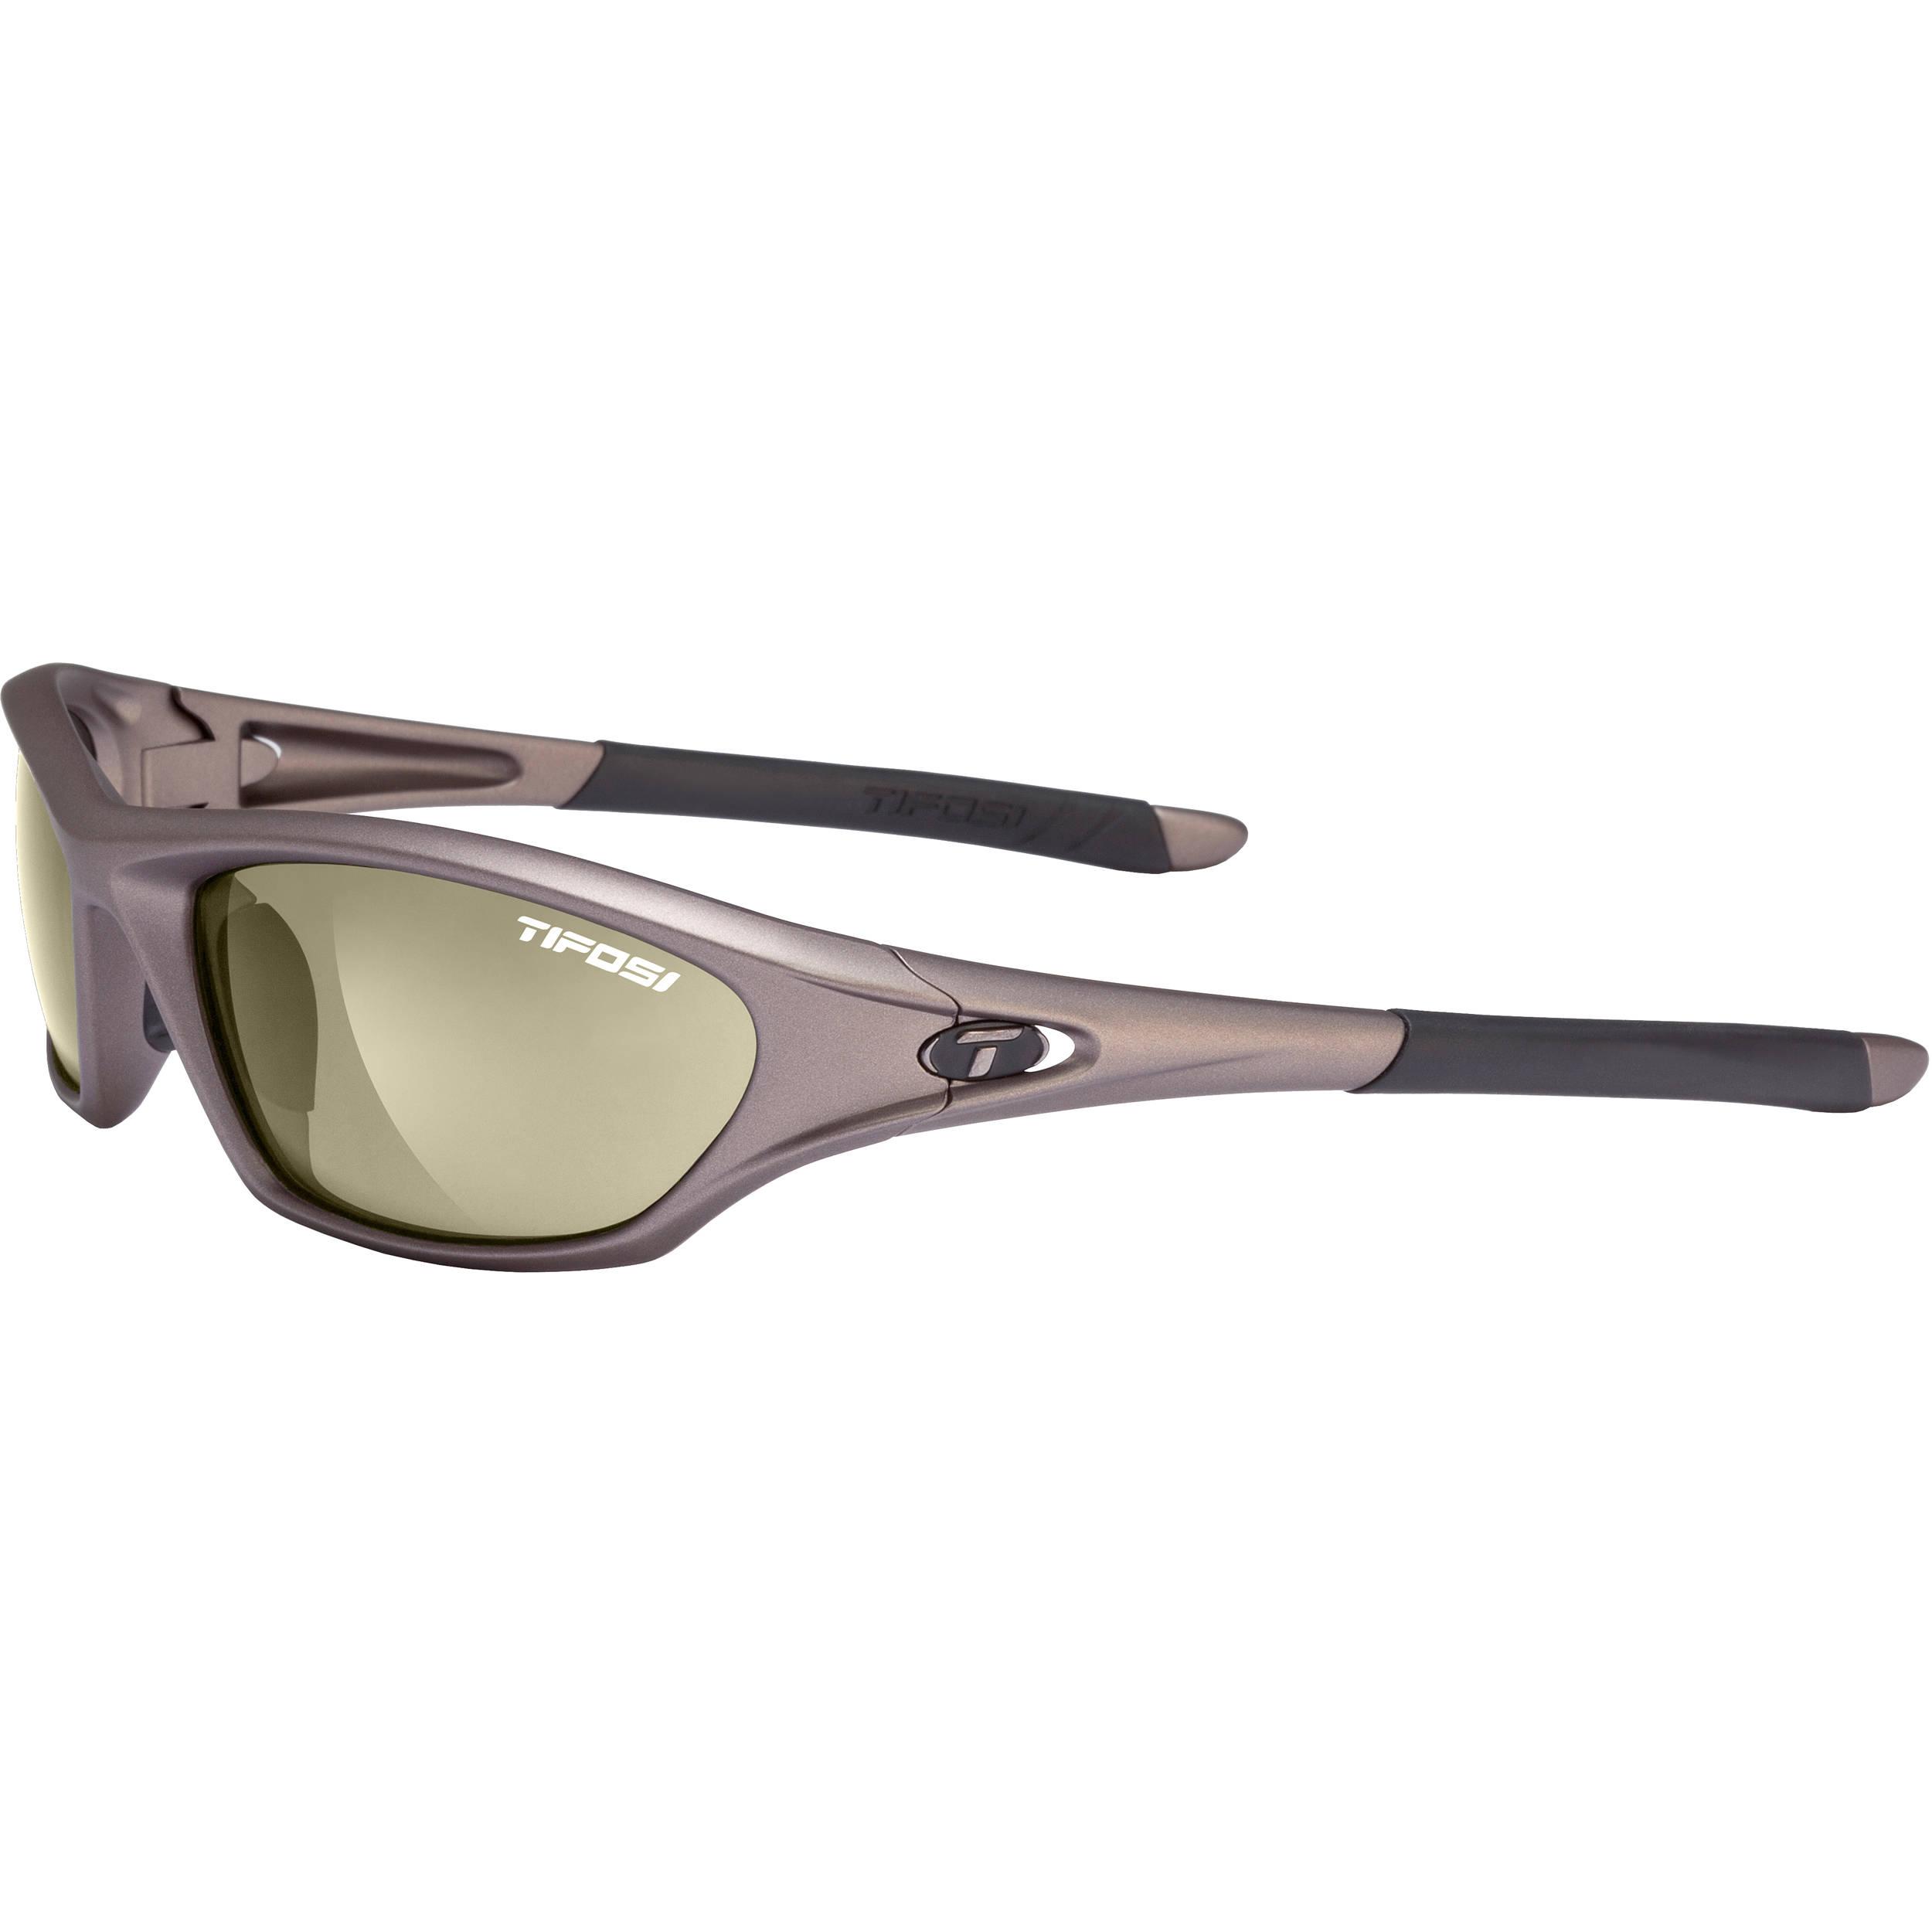 Tifosi Core Sunglasses (Iron Frames - GT Lenses) 200400475 B&H